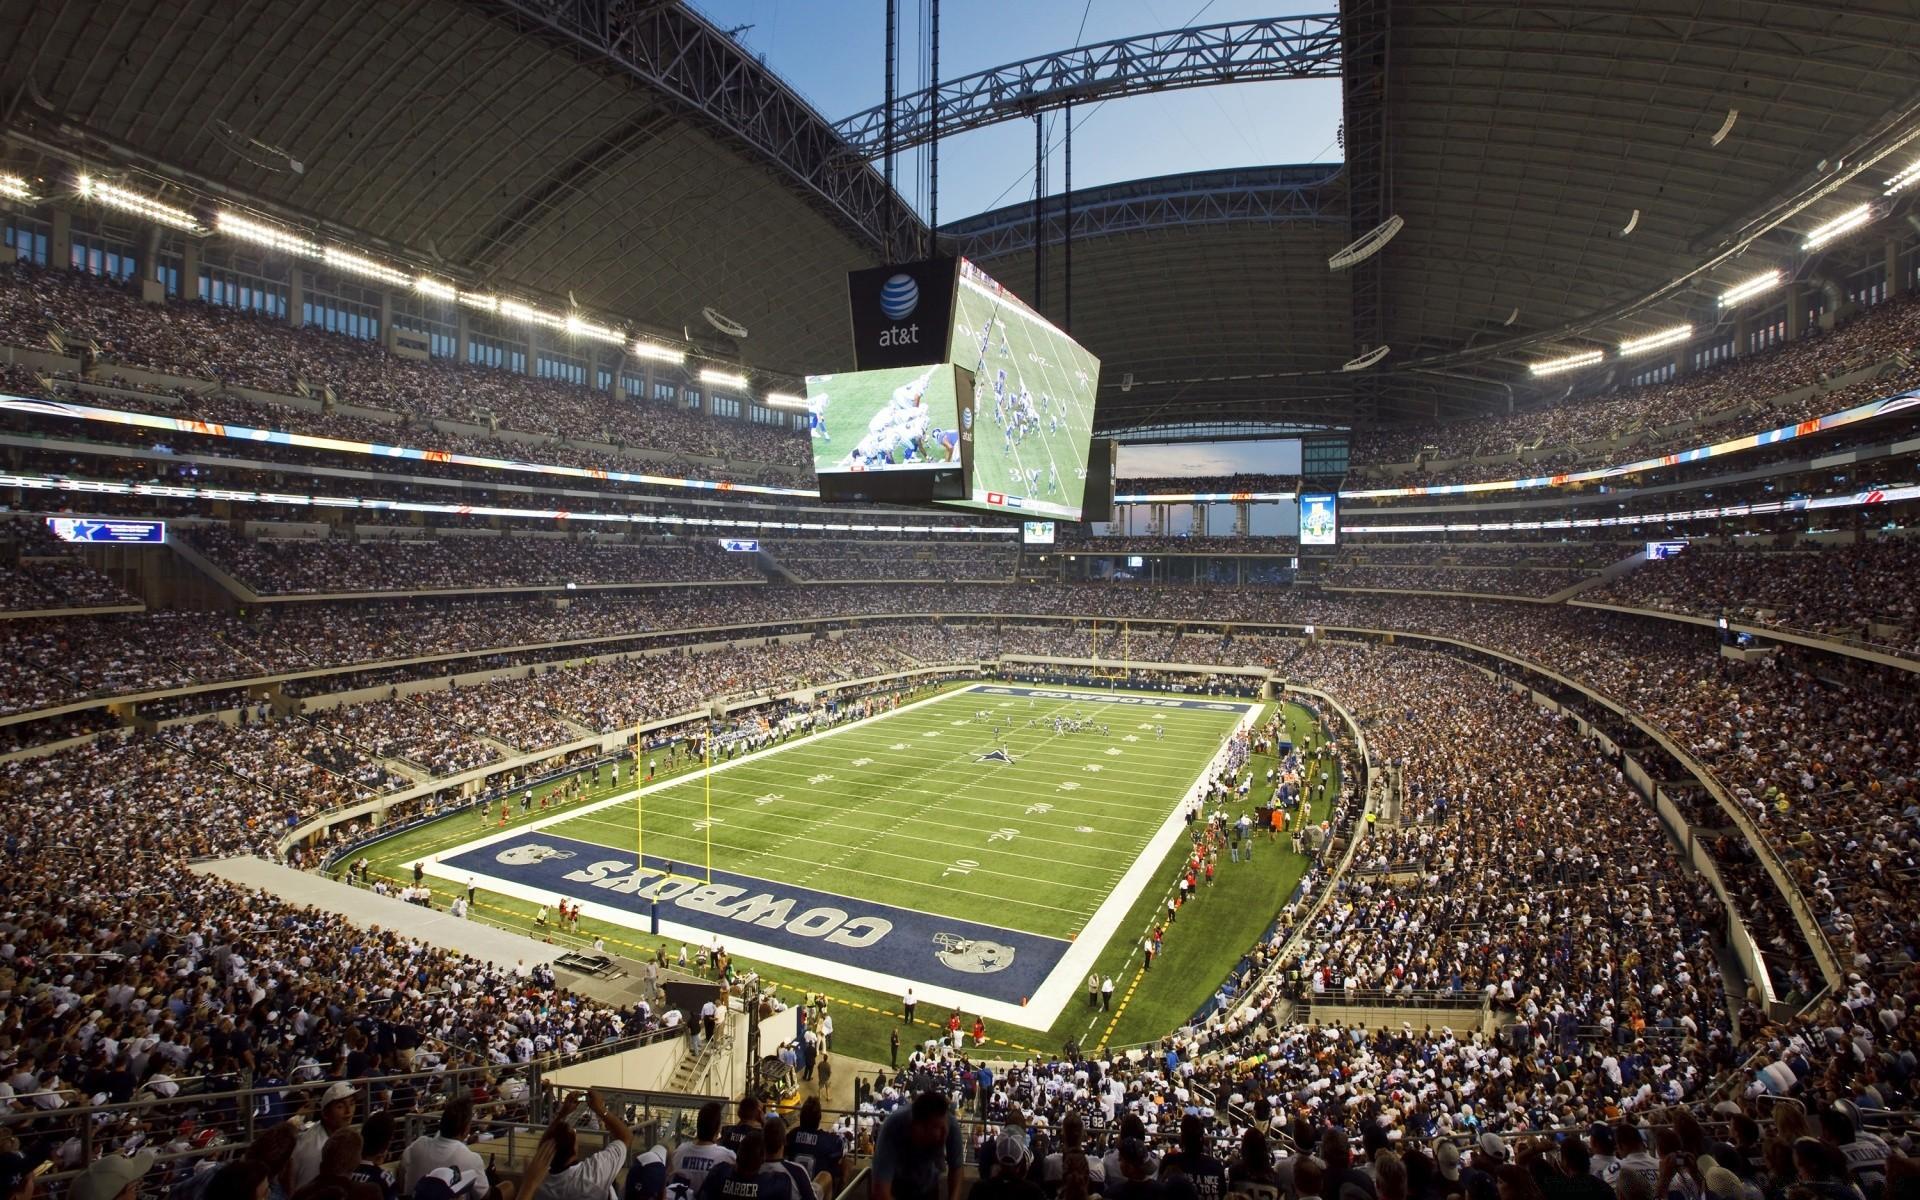 Football Stadium Competition Grandstand Soccer Sports - Dallas Cowboys Stadium Hd - HD Wallpaper